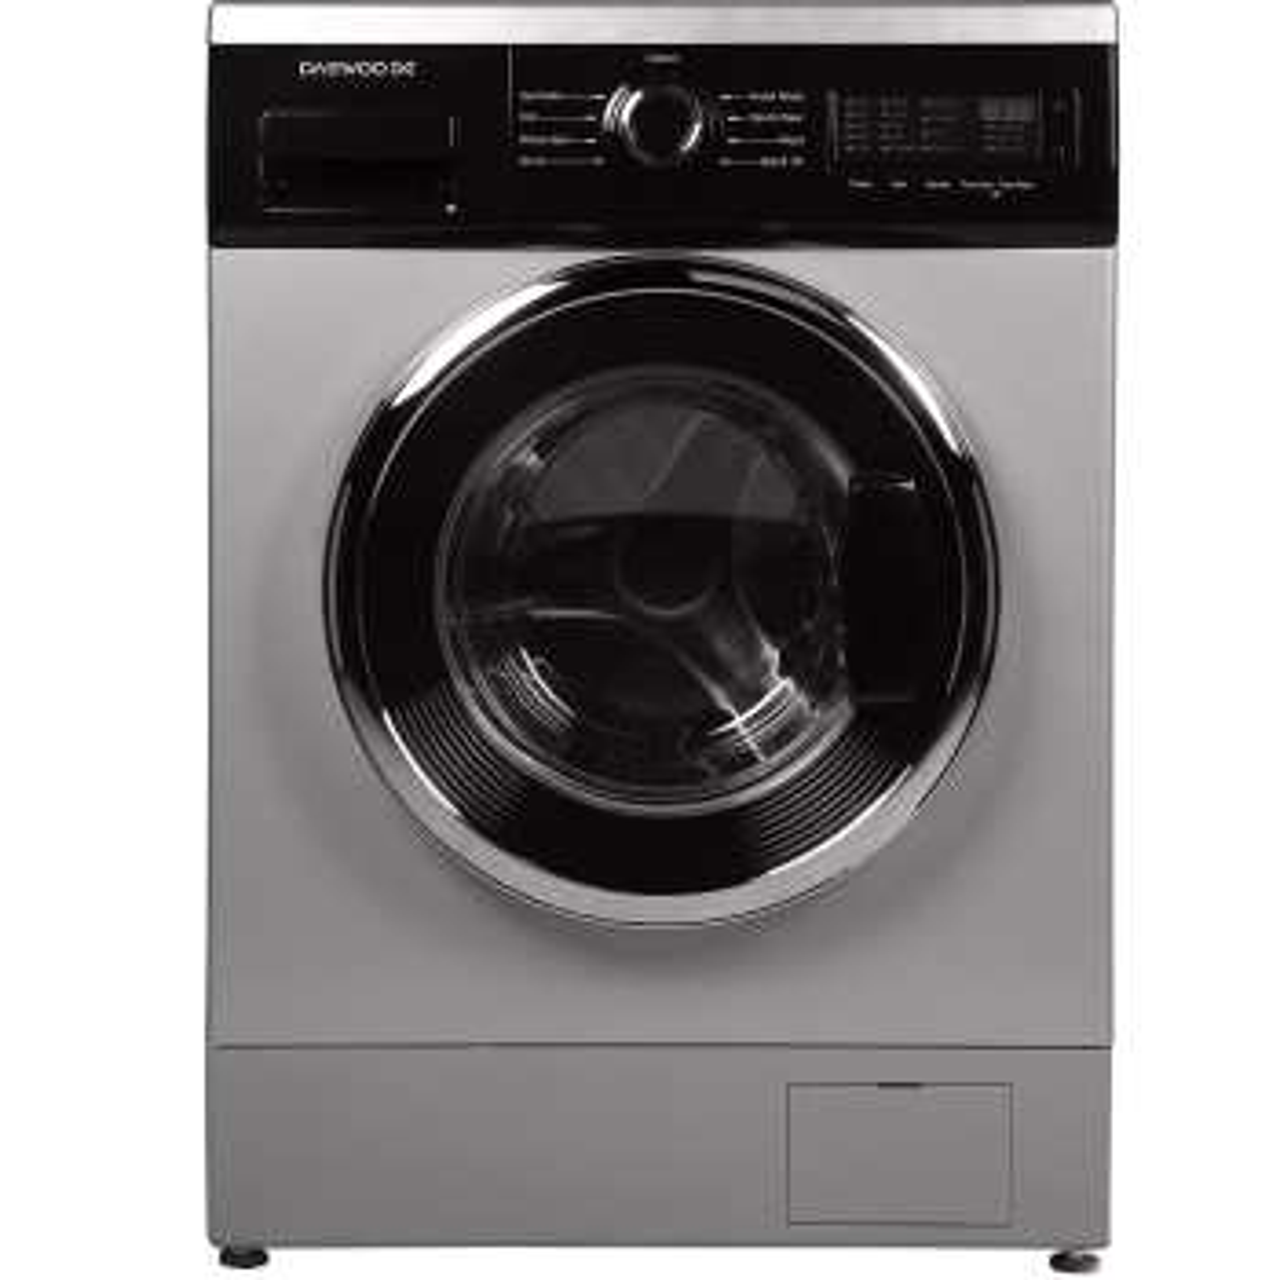 ماشین لباسشویی دوو مدل DWK-8510 ظرفیت 8 کیلوگرم | Daewoo DWK-8510 Washing Machine 8Kg